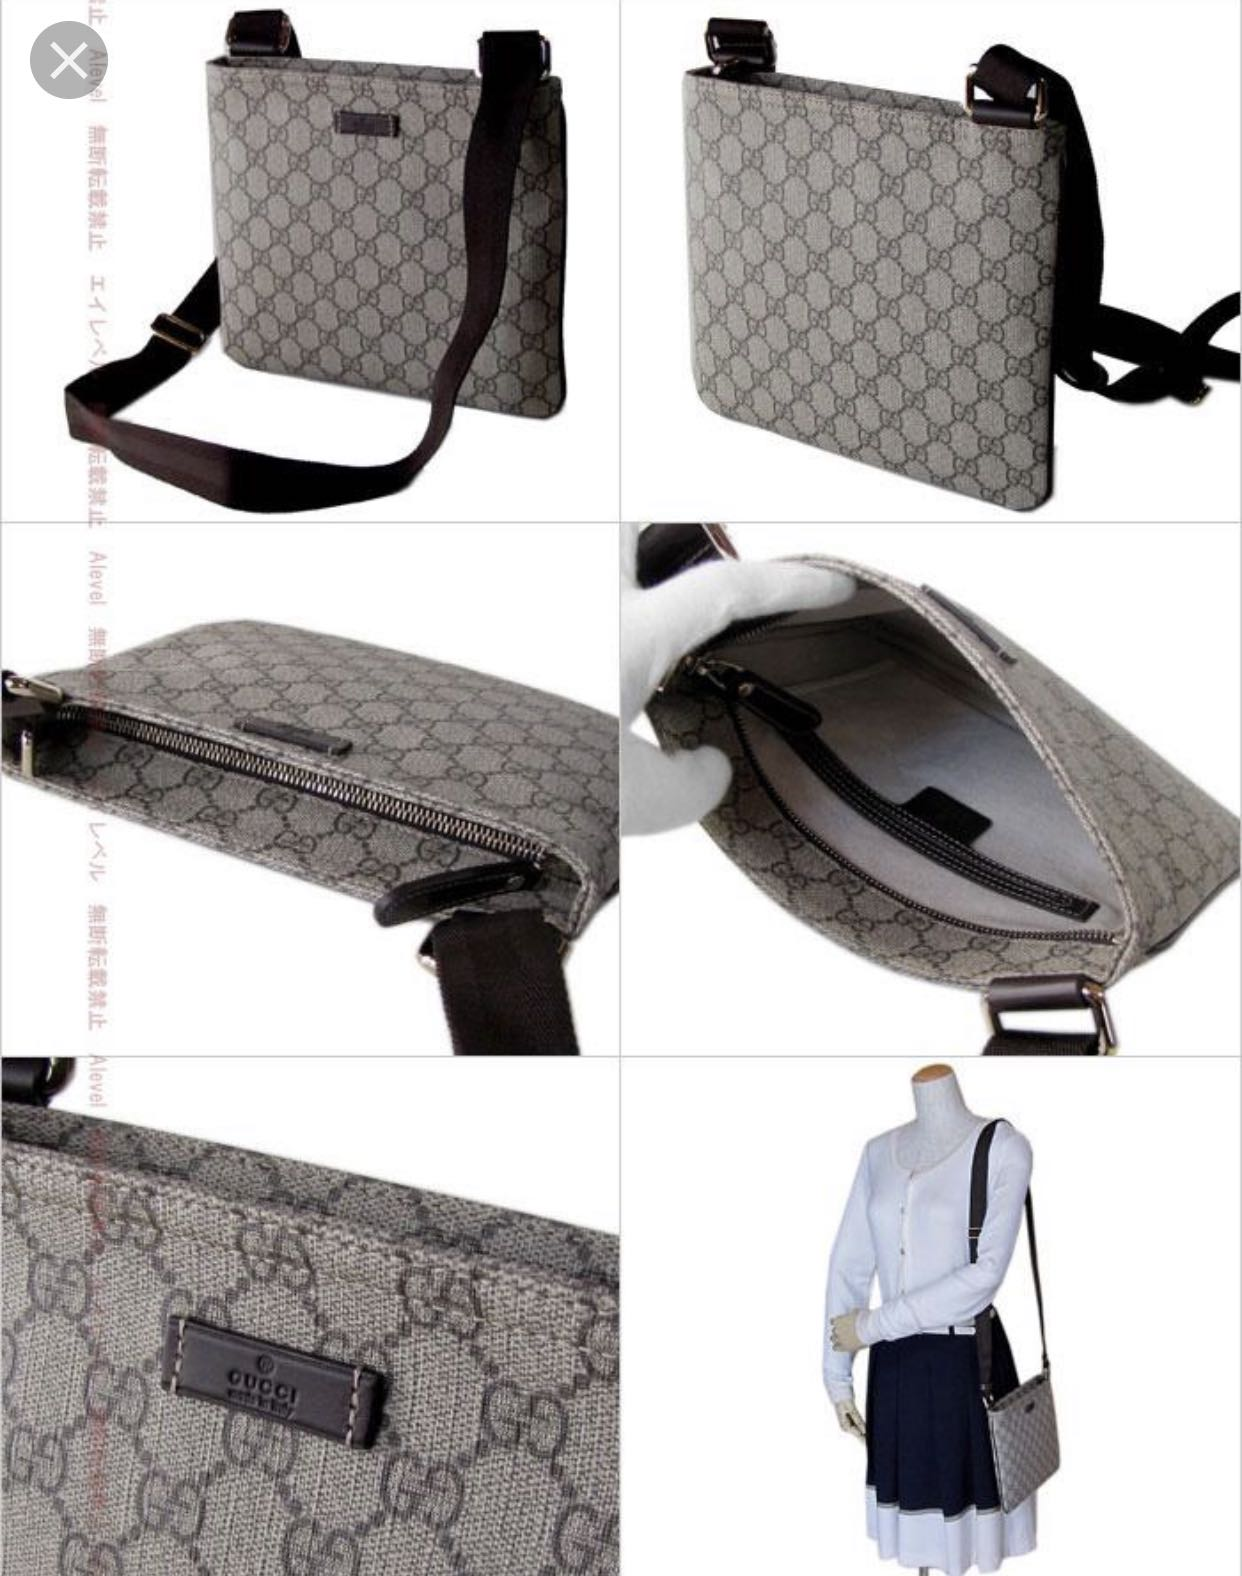 5a5db4d9049b Gucci messenger sling bag (grey), Luxury, Bags & Wallets, Sling Bags ...